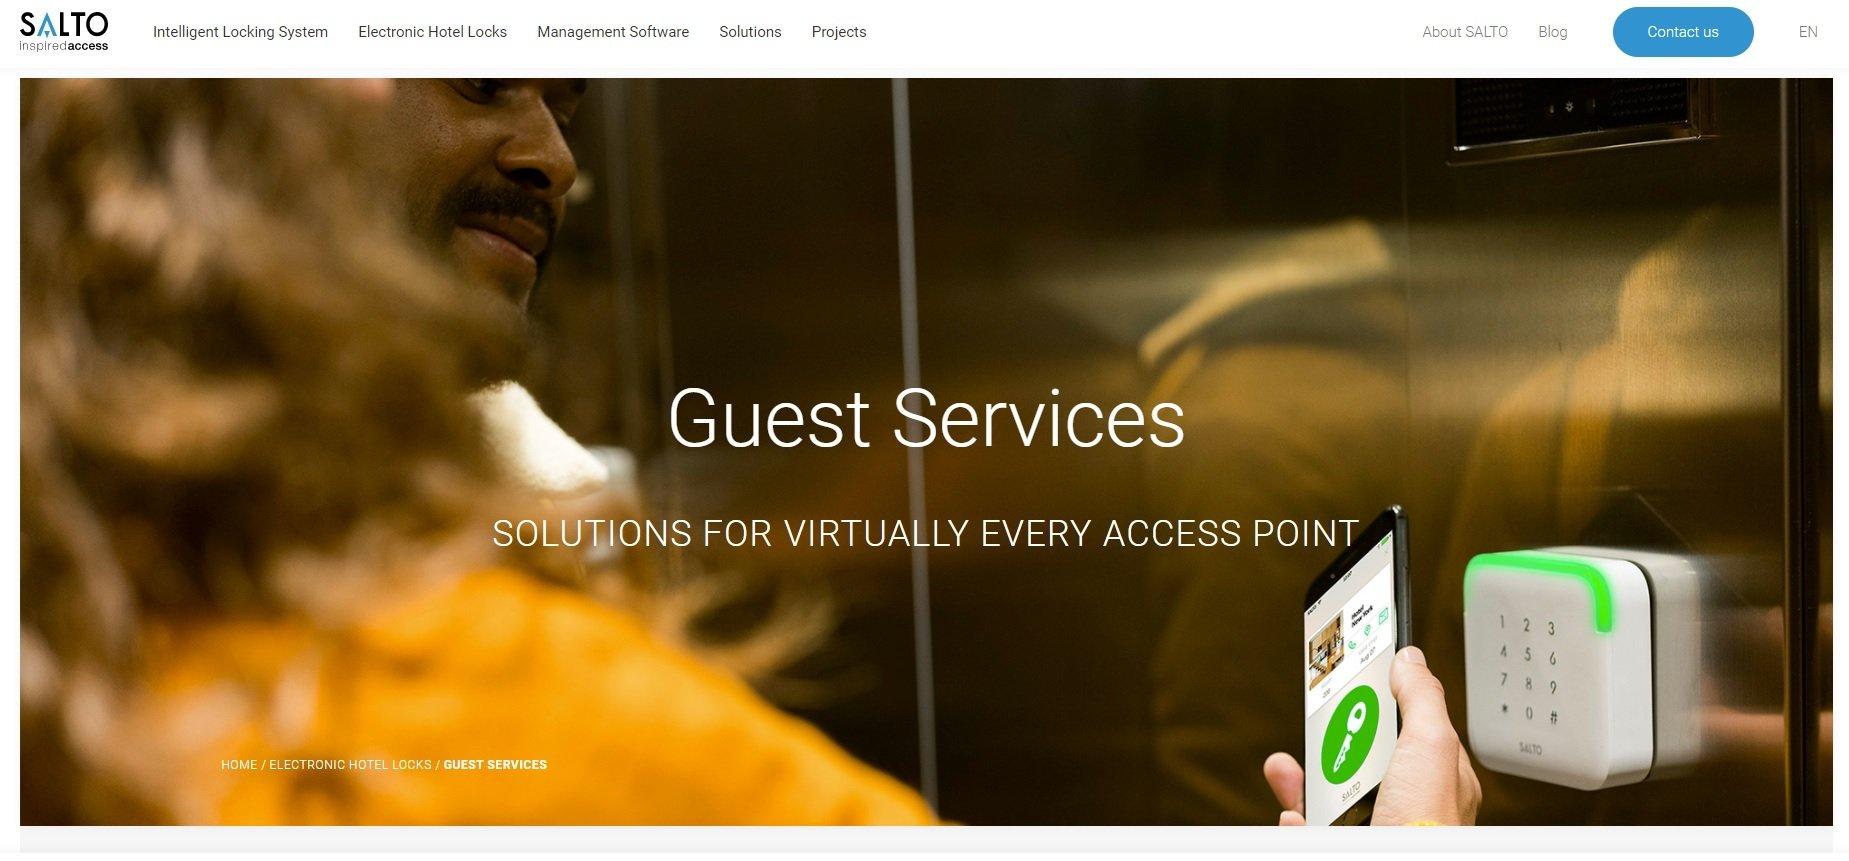 02_Salto Guest Services smartphone access screenshot